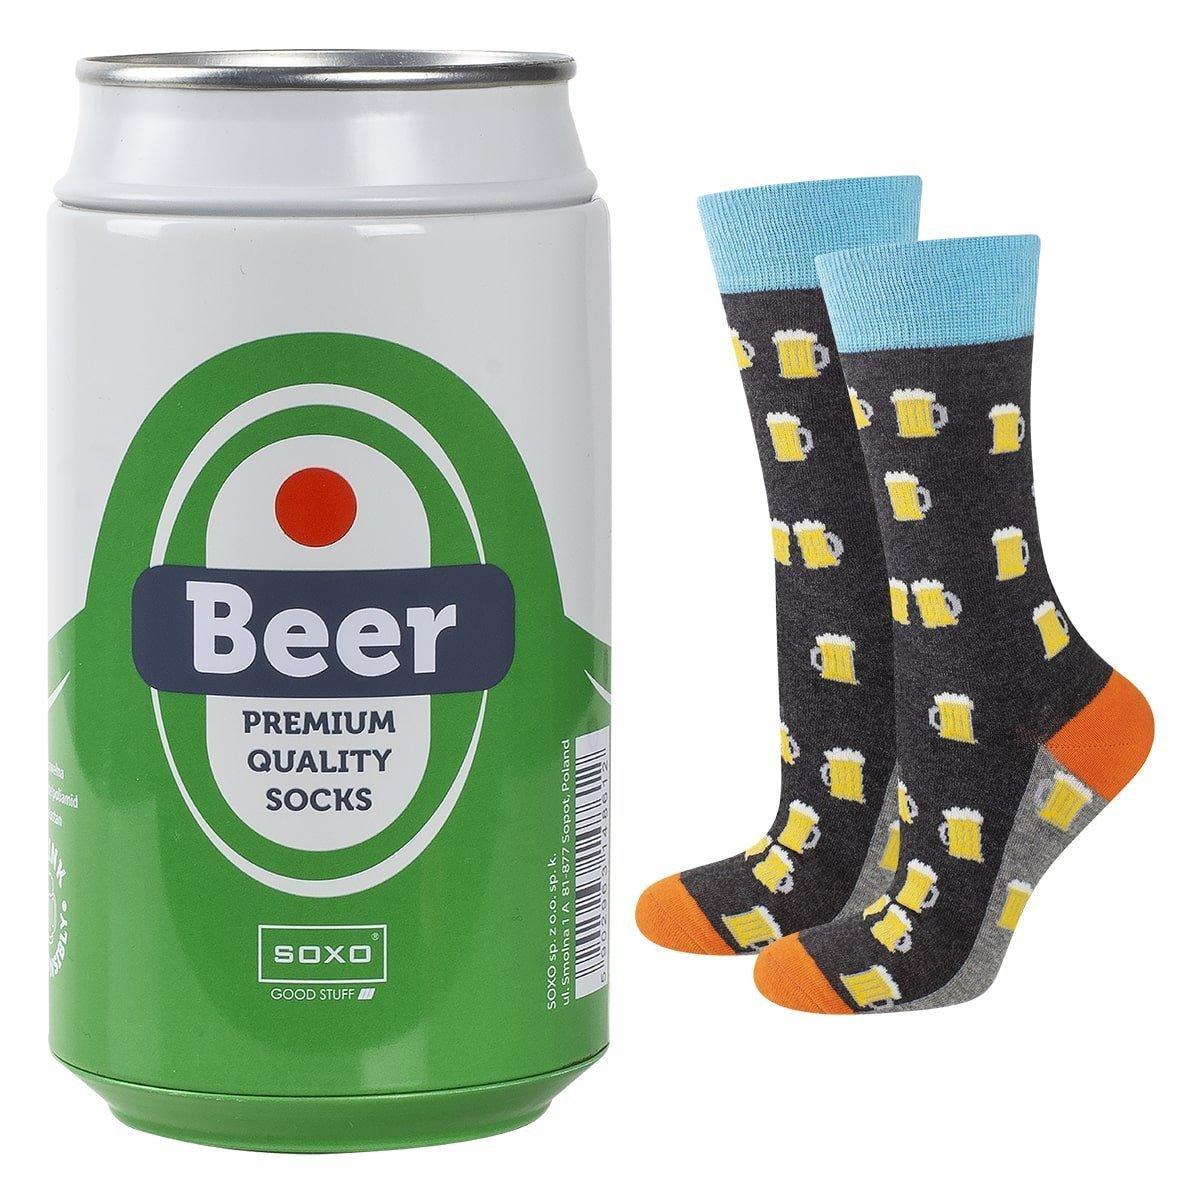 Beer - Pivo v plechu-DARGRA